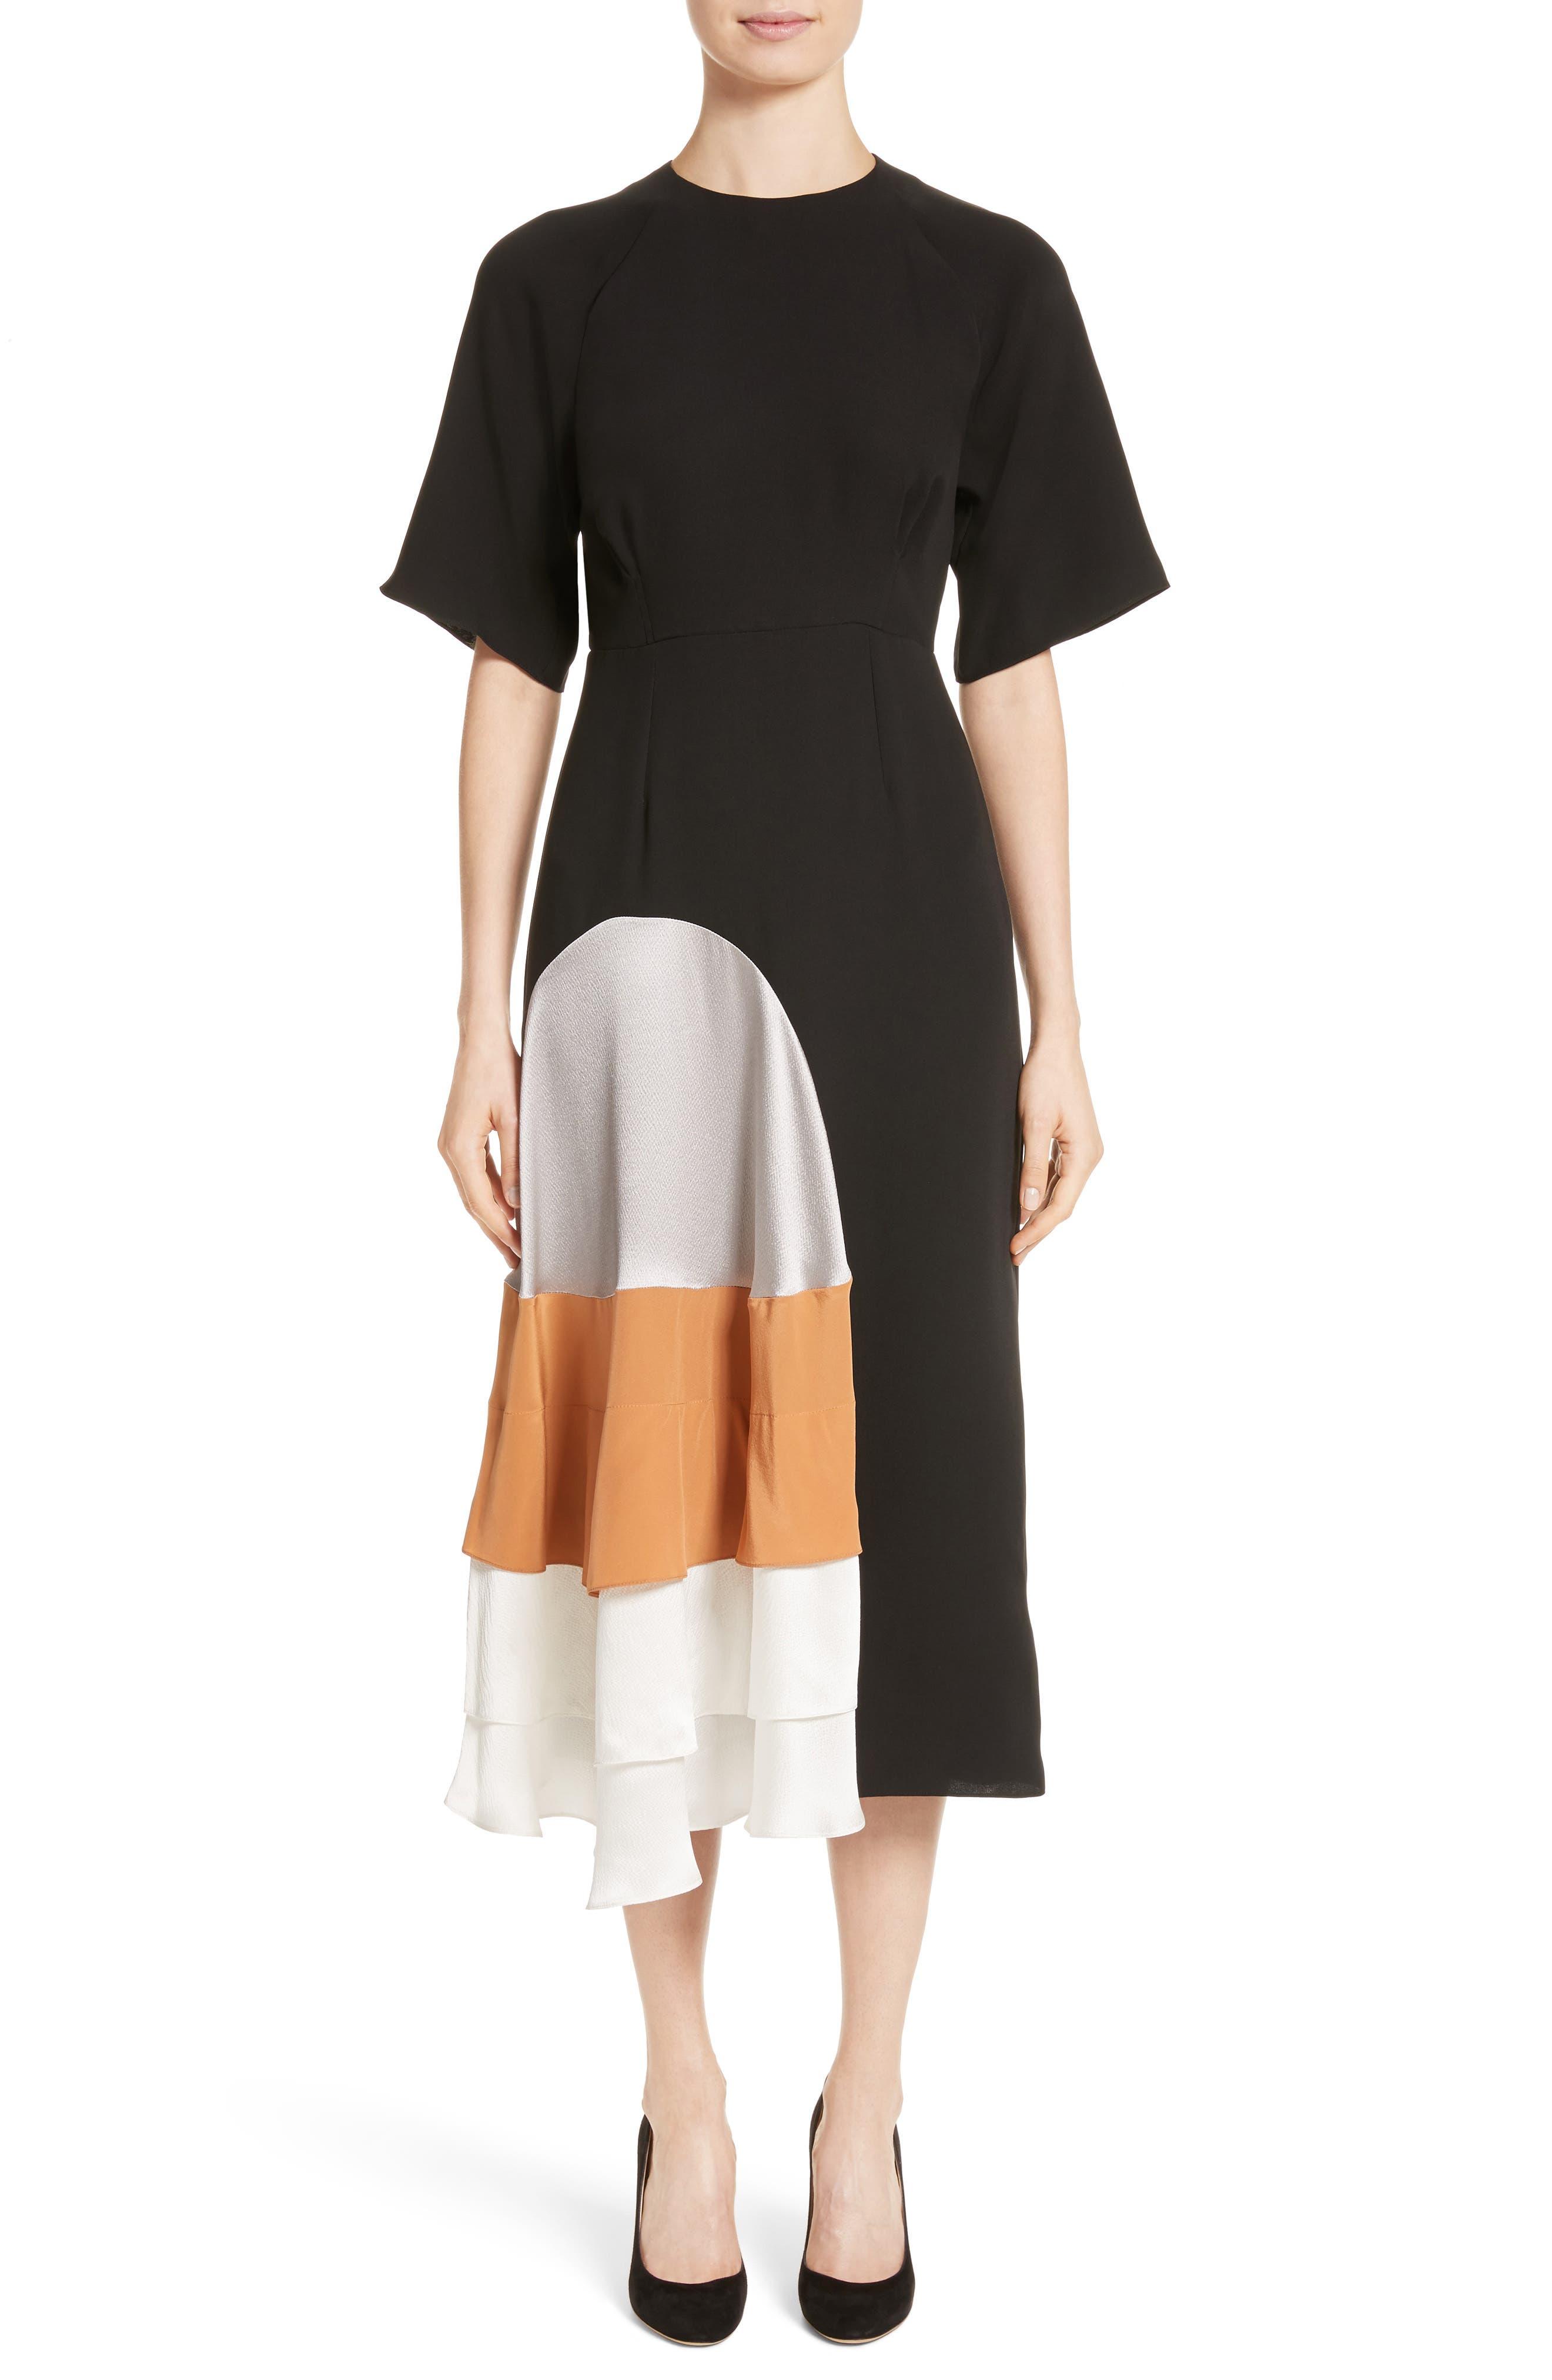 Rauma Silk Dress,                             Main thumbnail 1, color,                             Black/ Silver/ Sand/ Ivory